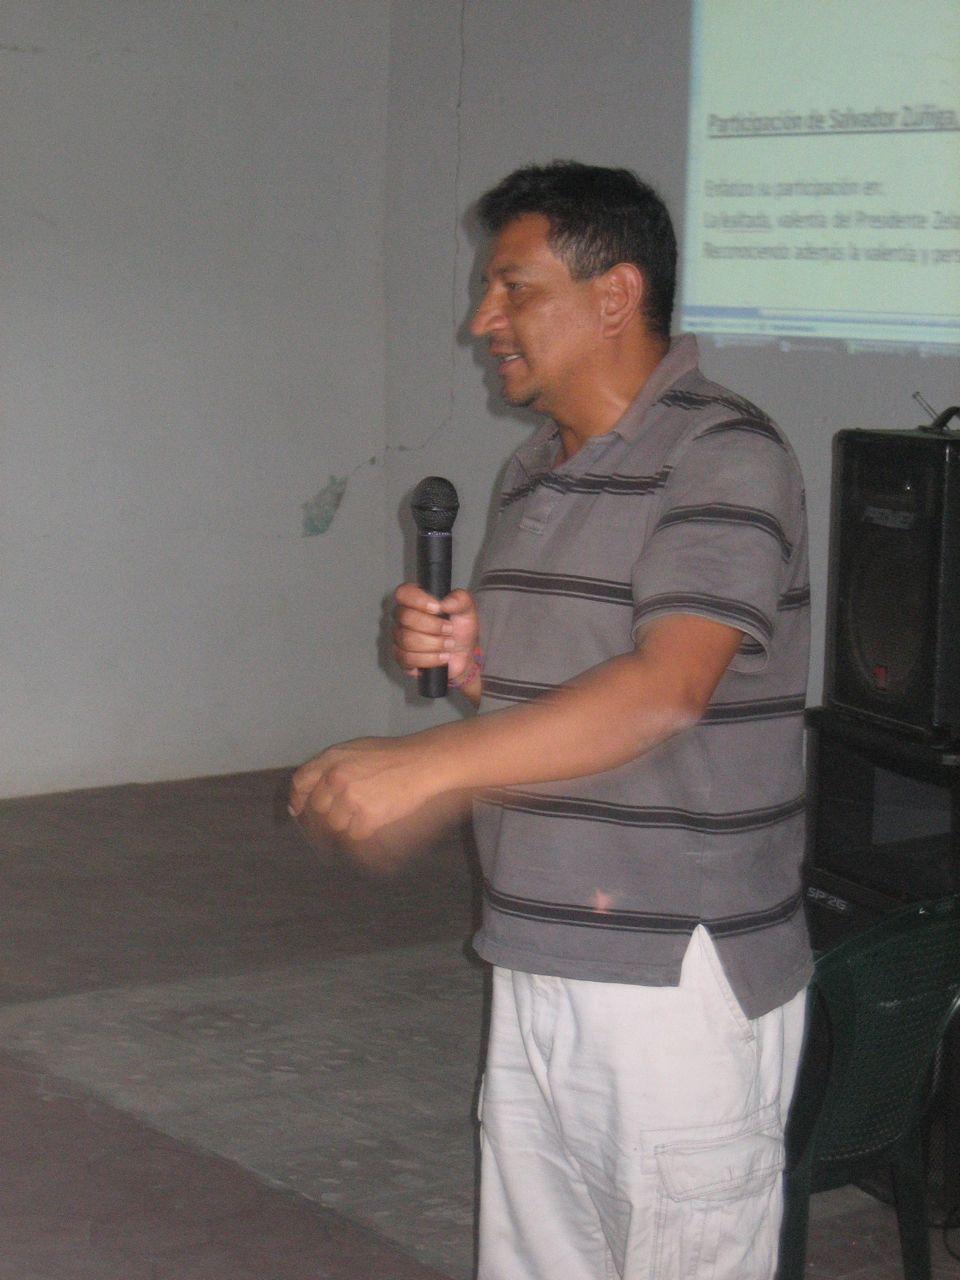 Honduras resists honduras resiste indigenous leader for Farcical failure